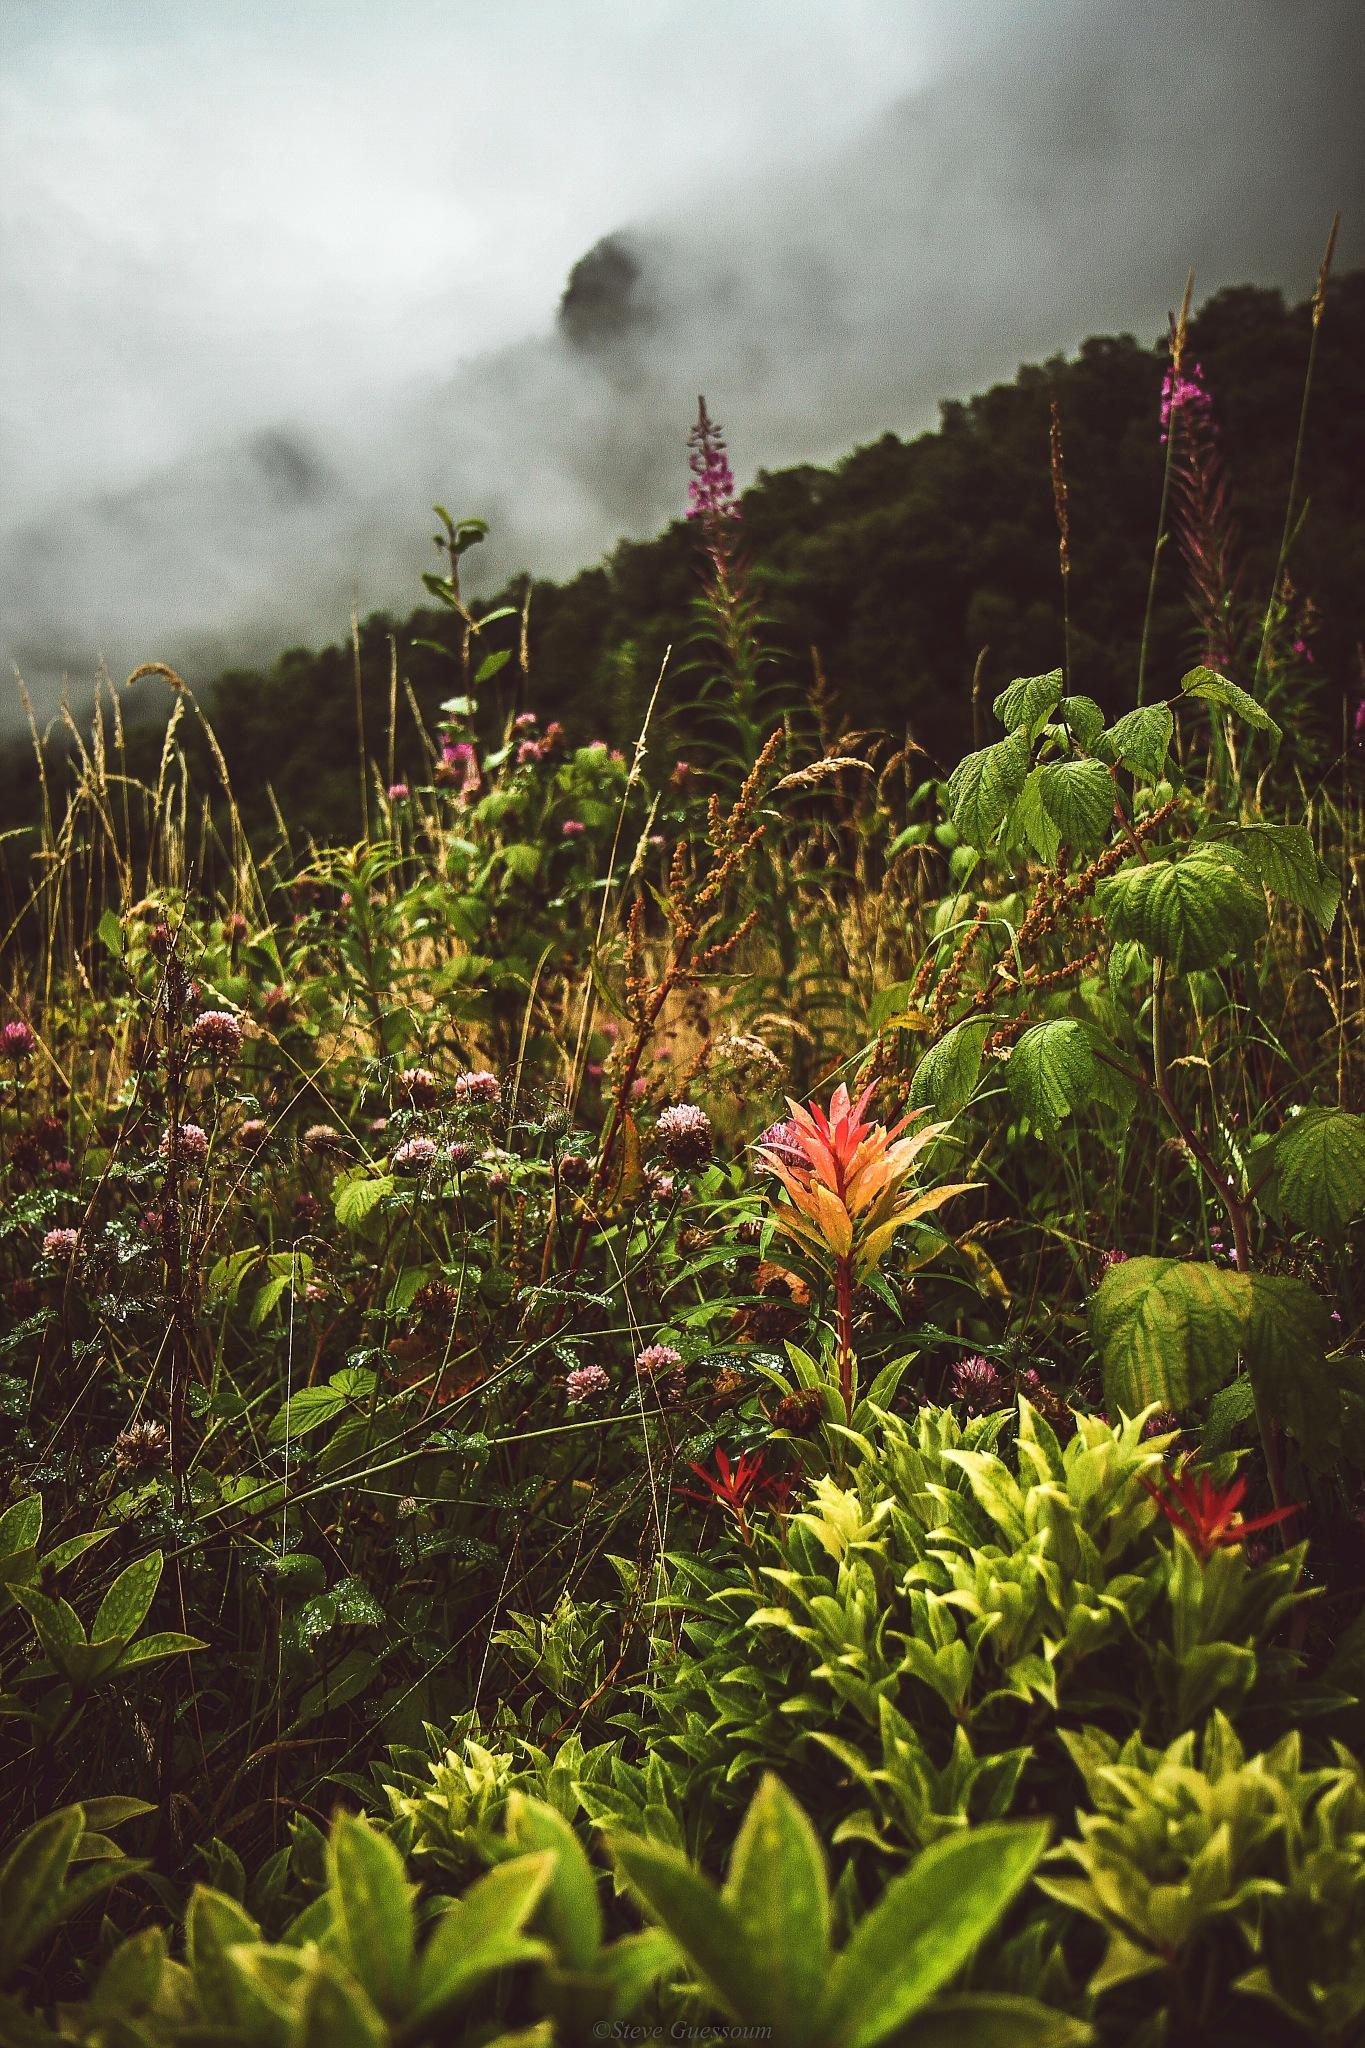 Vikedal Norway  by Steve Guessoum